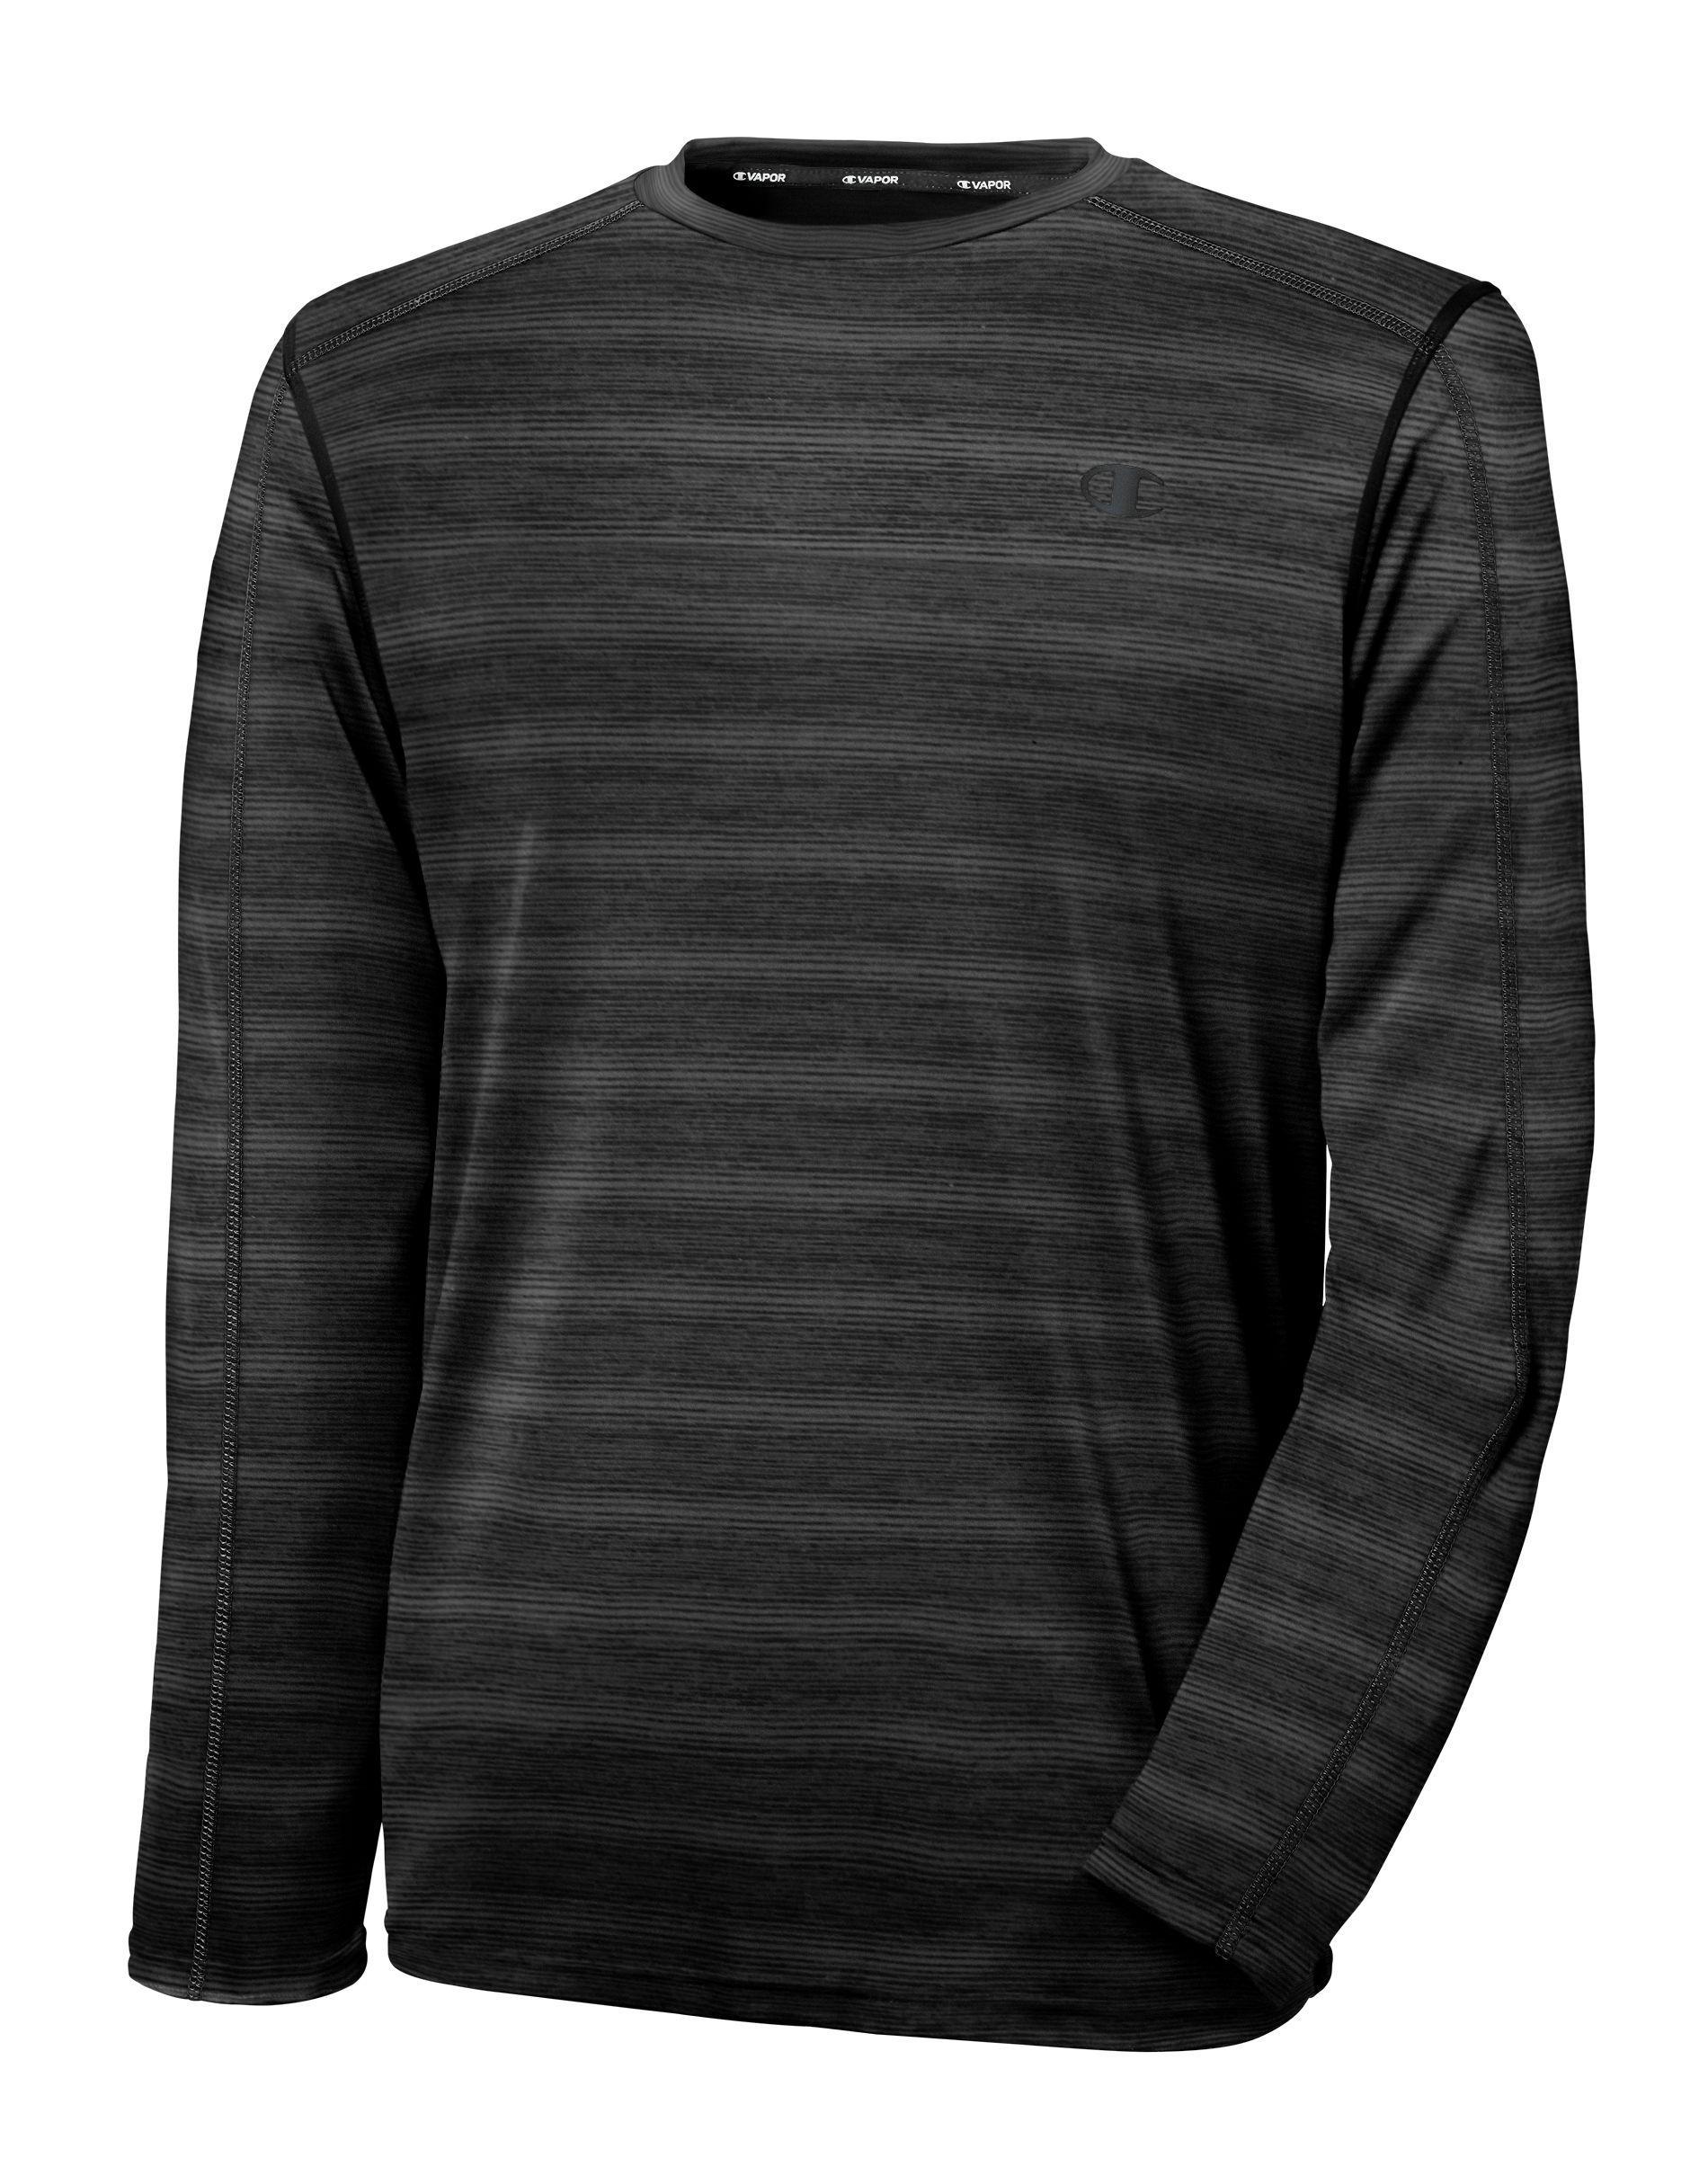 217eeaf9 Champion Mens Vapor Powertrain Heathered Long Sleeve T Shirt